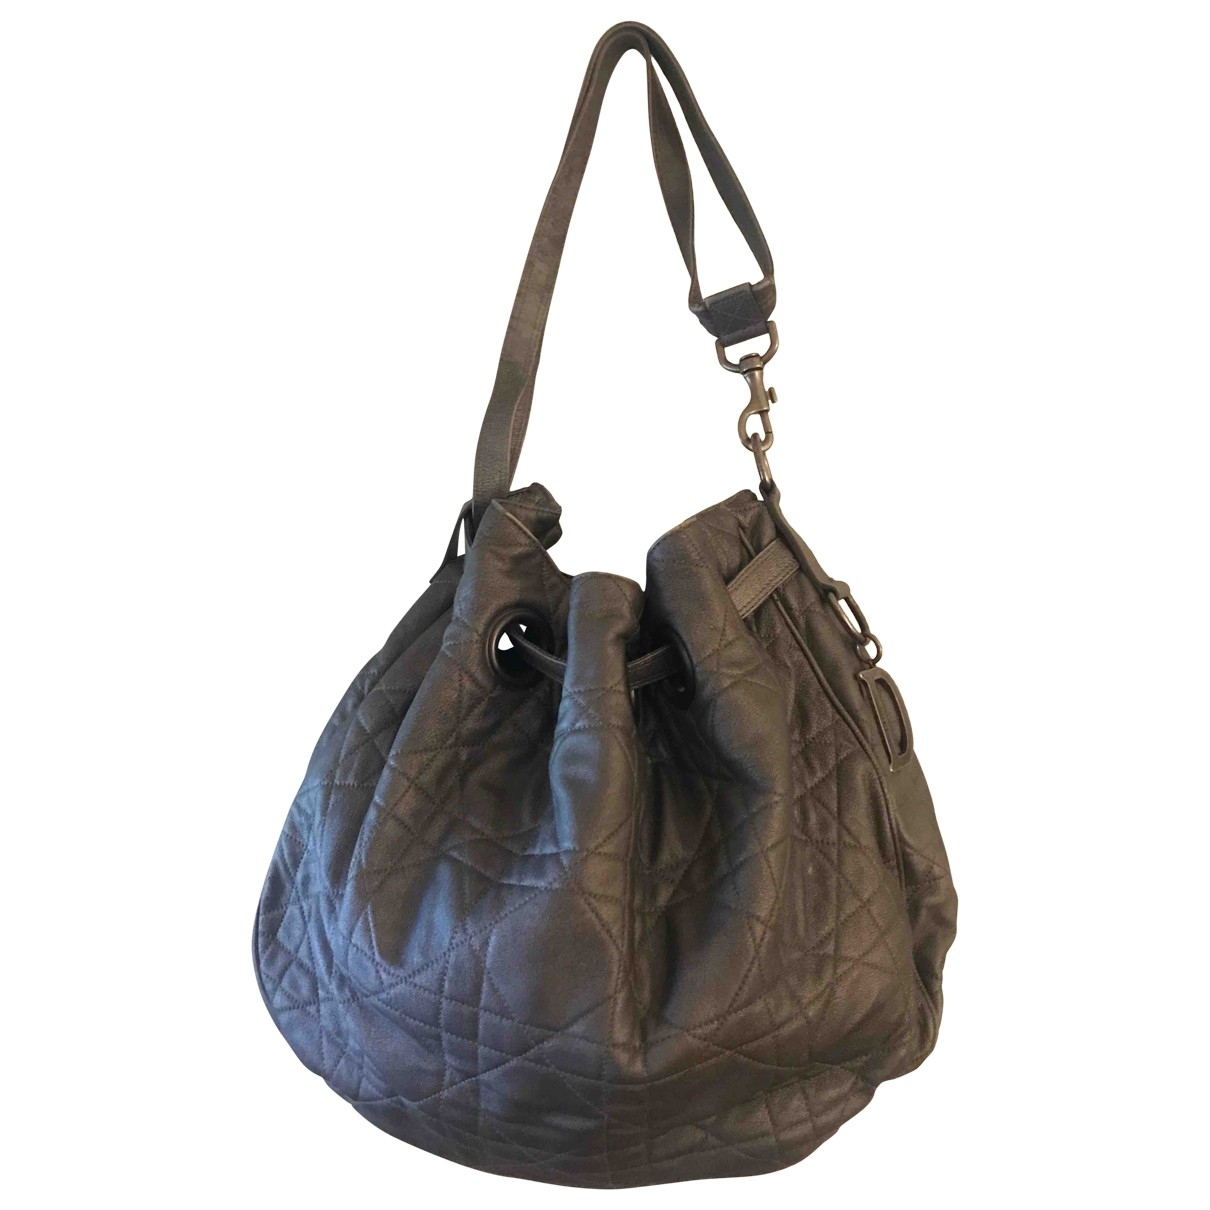 Dior - Sac a main   pour femme en cuir - argente